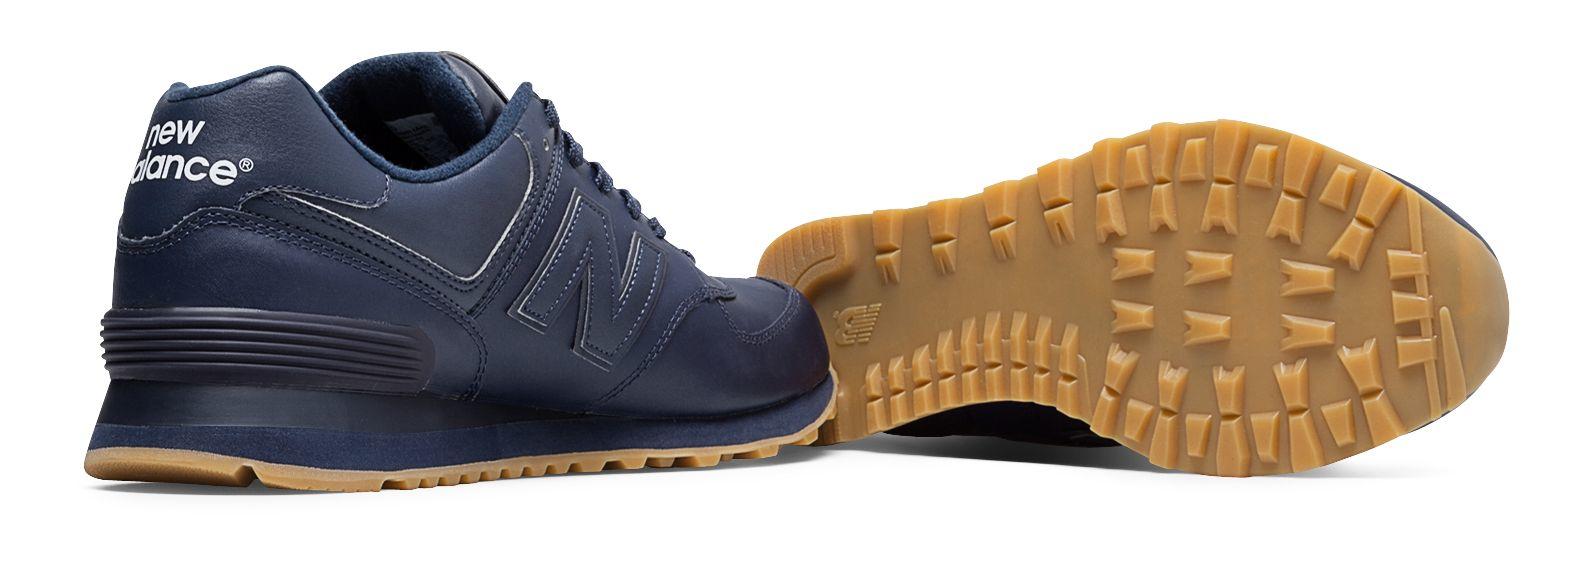 In Men 574 Balance Leather For Blue Lyst New uwiTPXOkZ